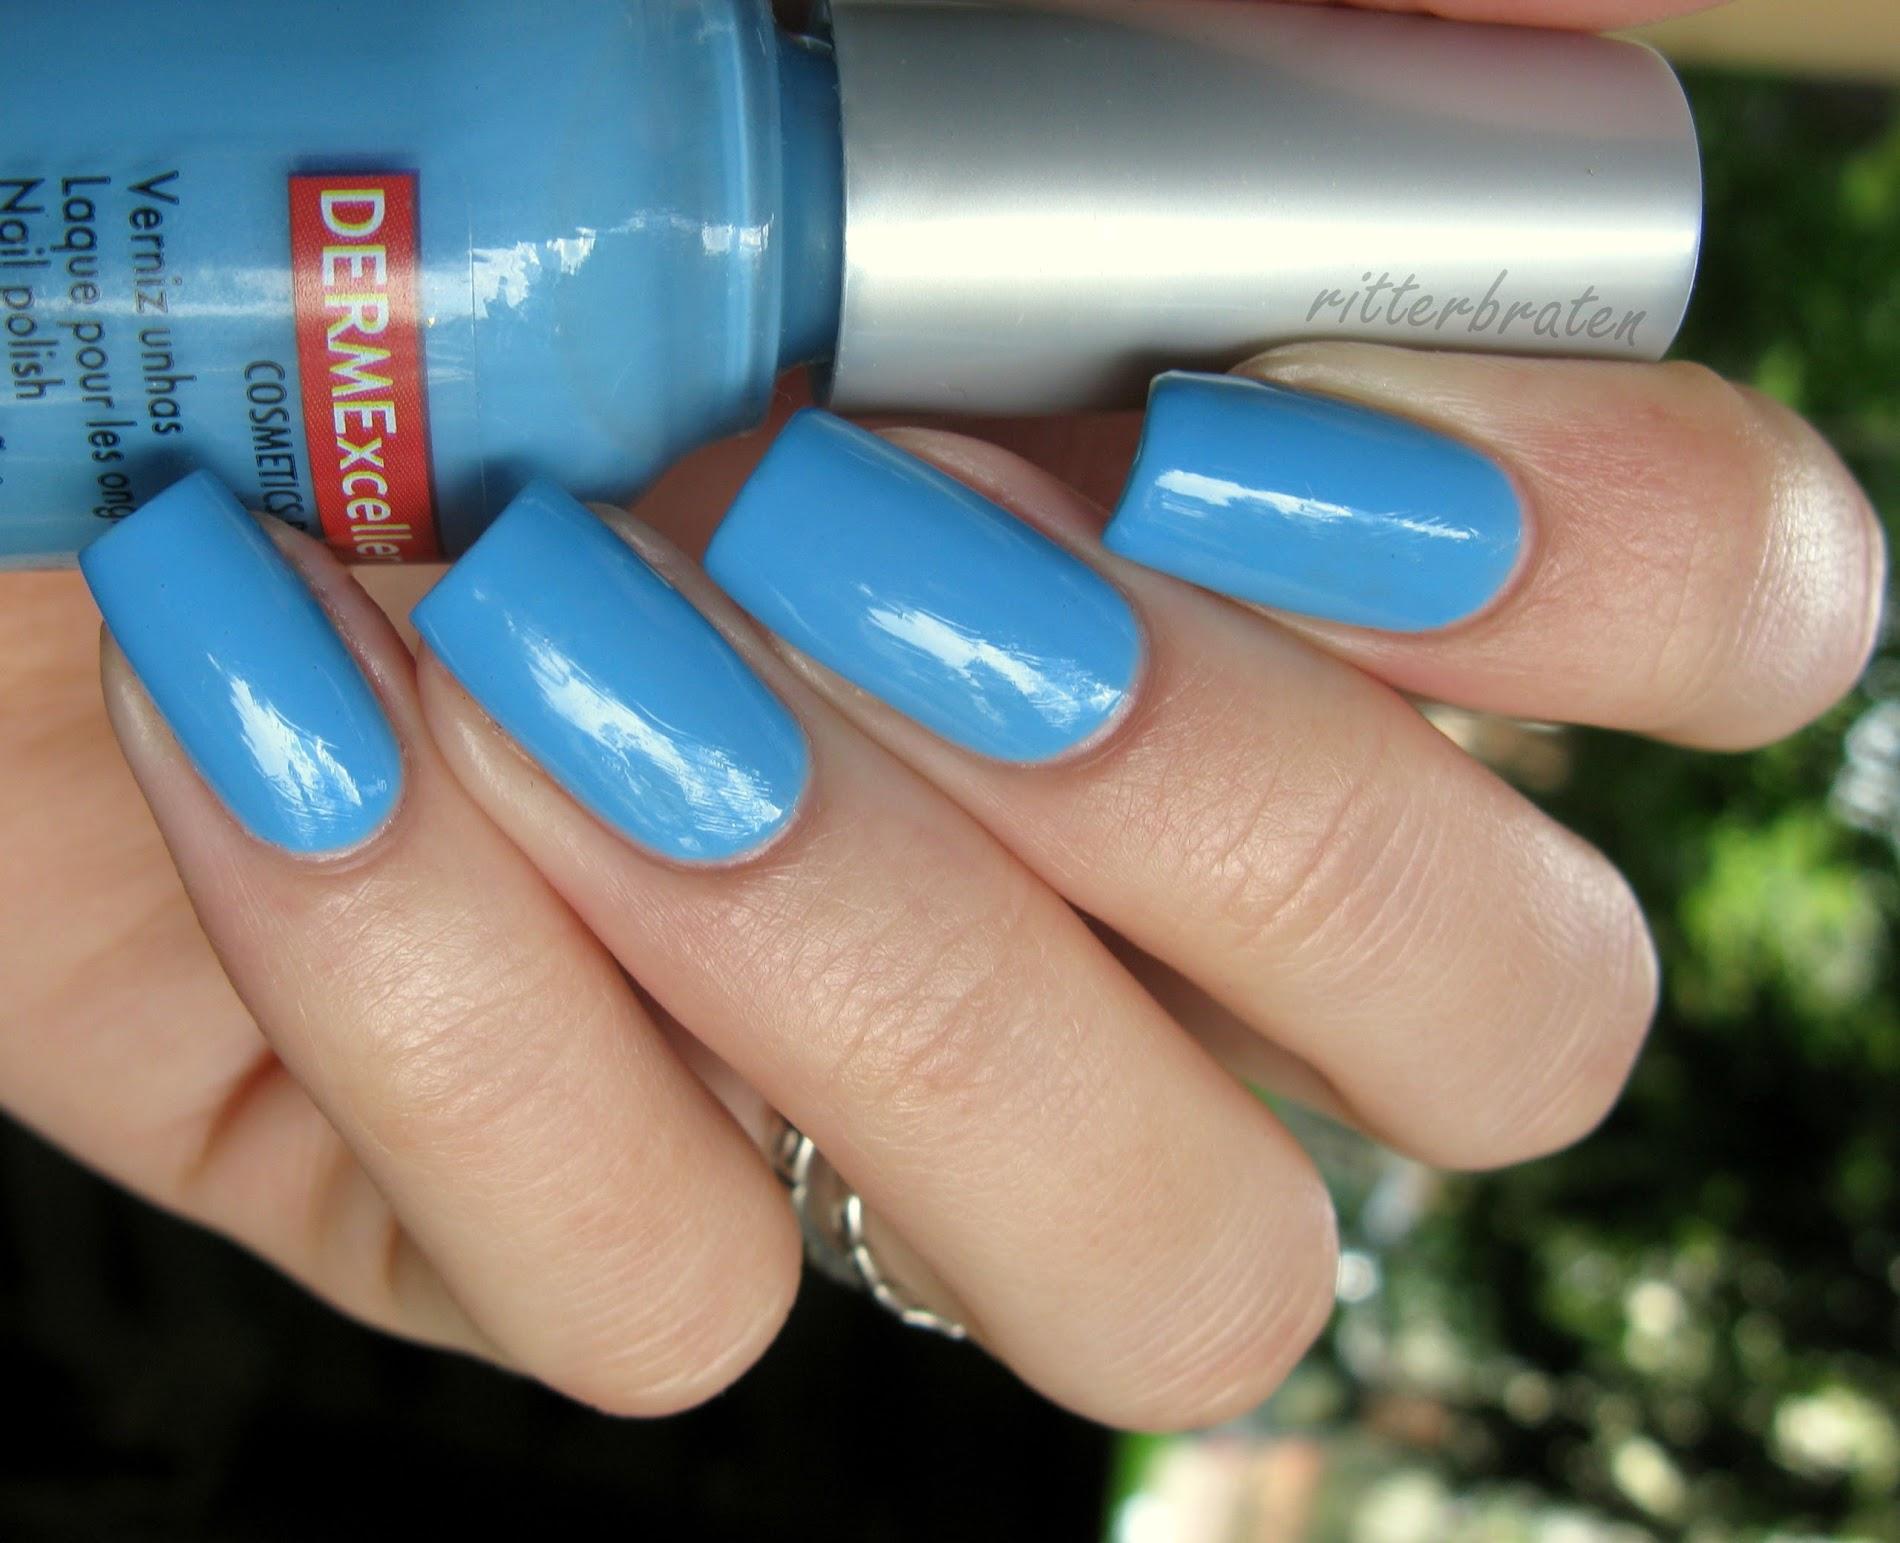 DERMEXcellence 55 nail polish verniz